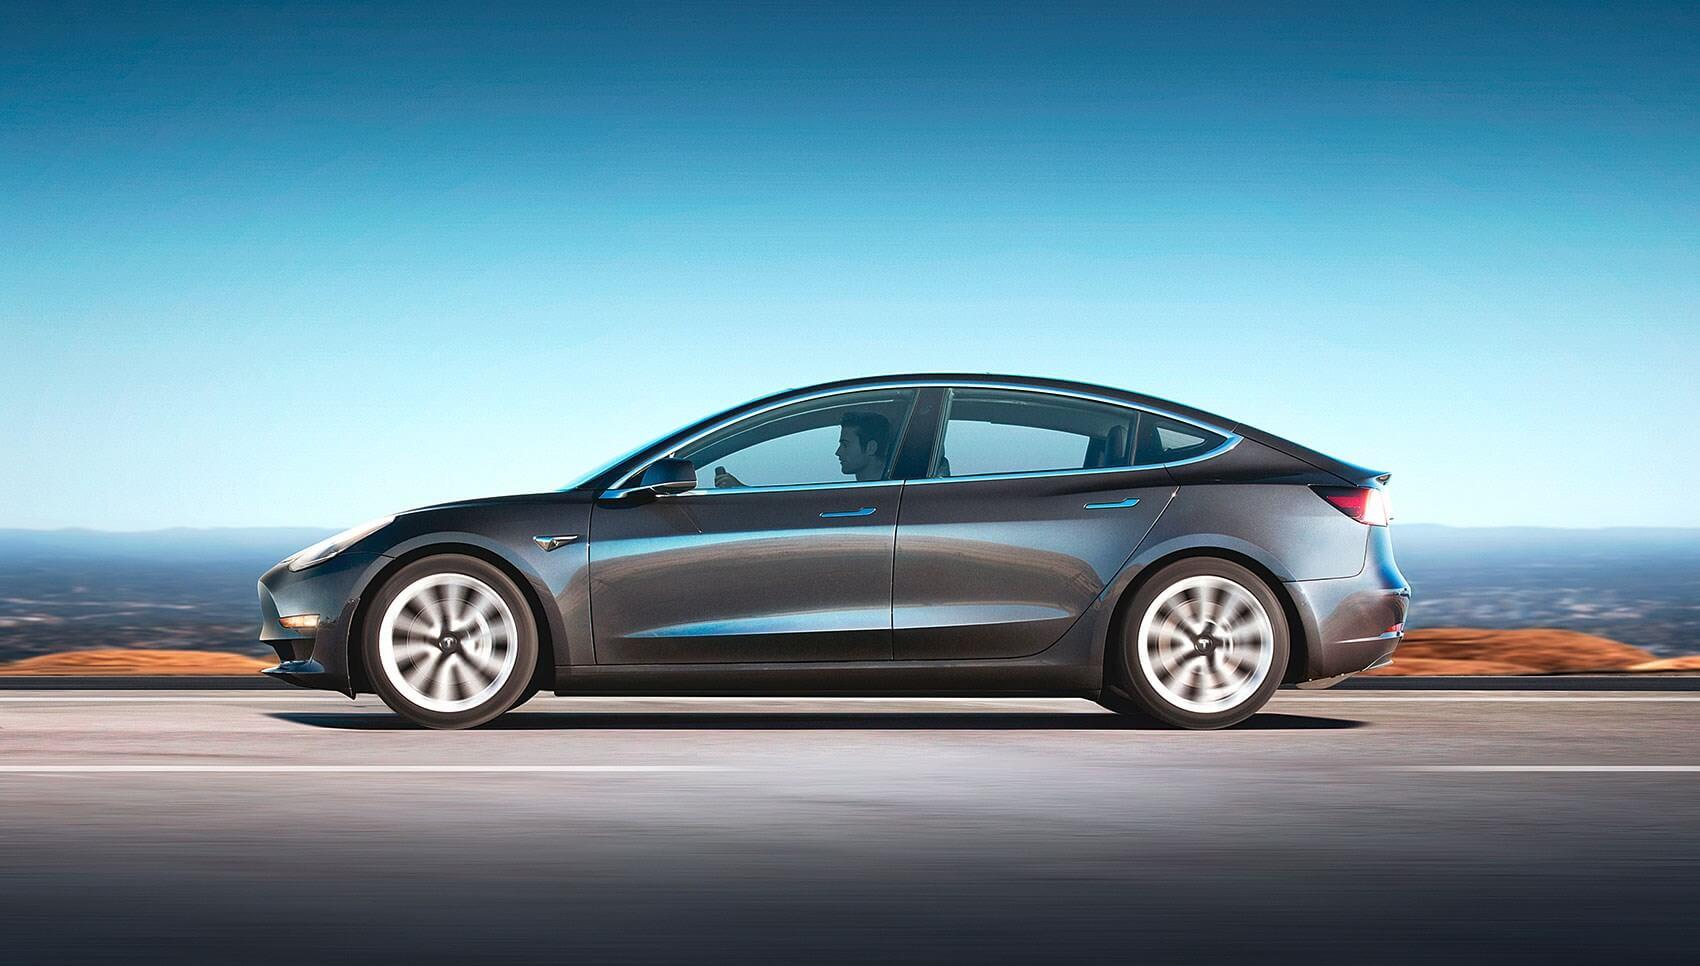 Американське видання купило Tesla Model 3 заради огляду